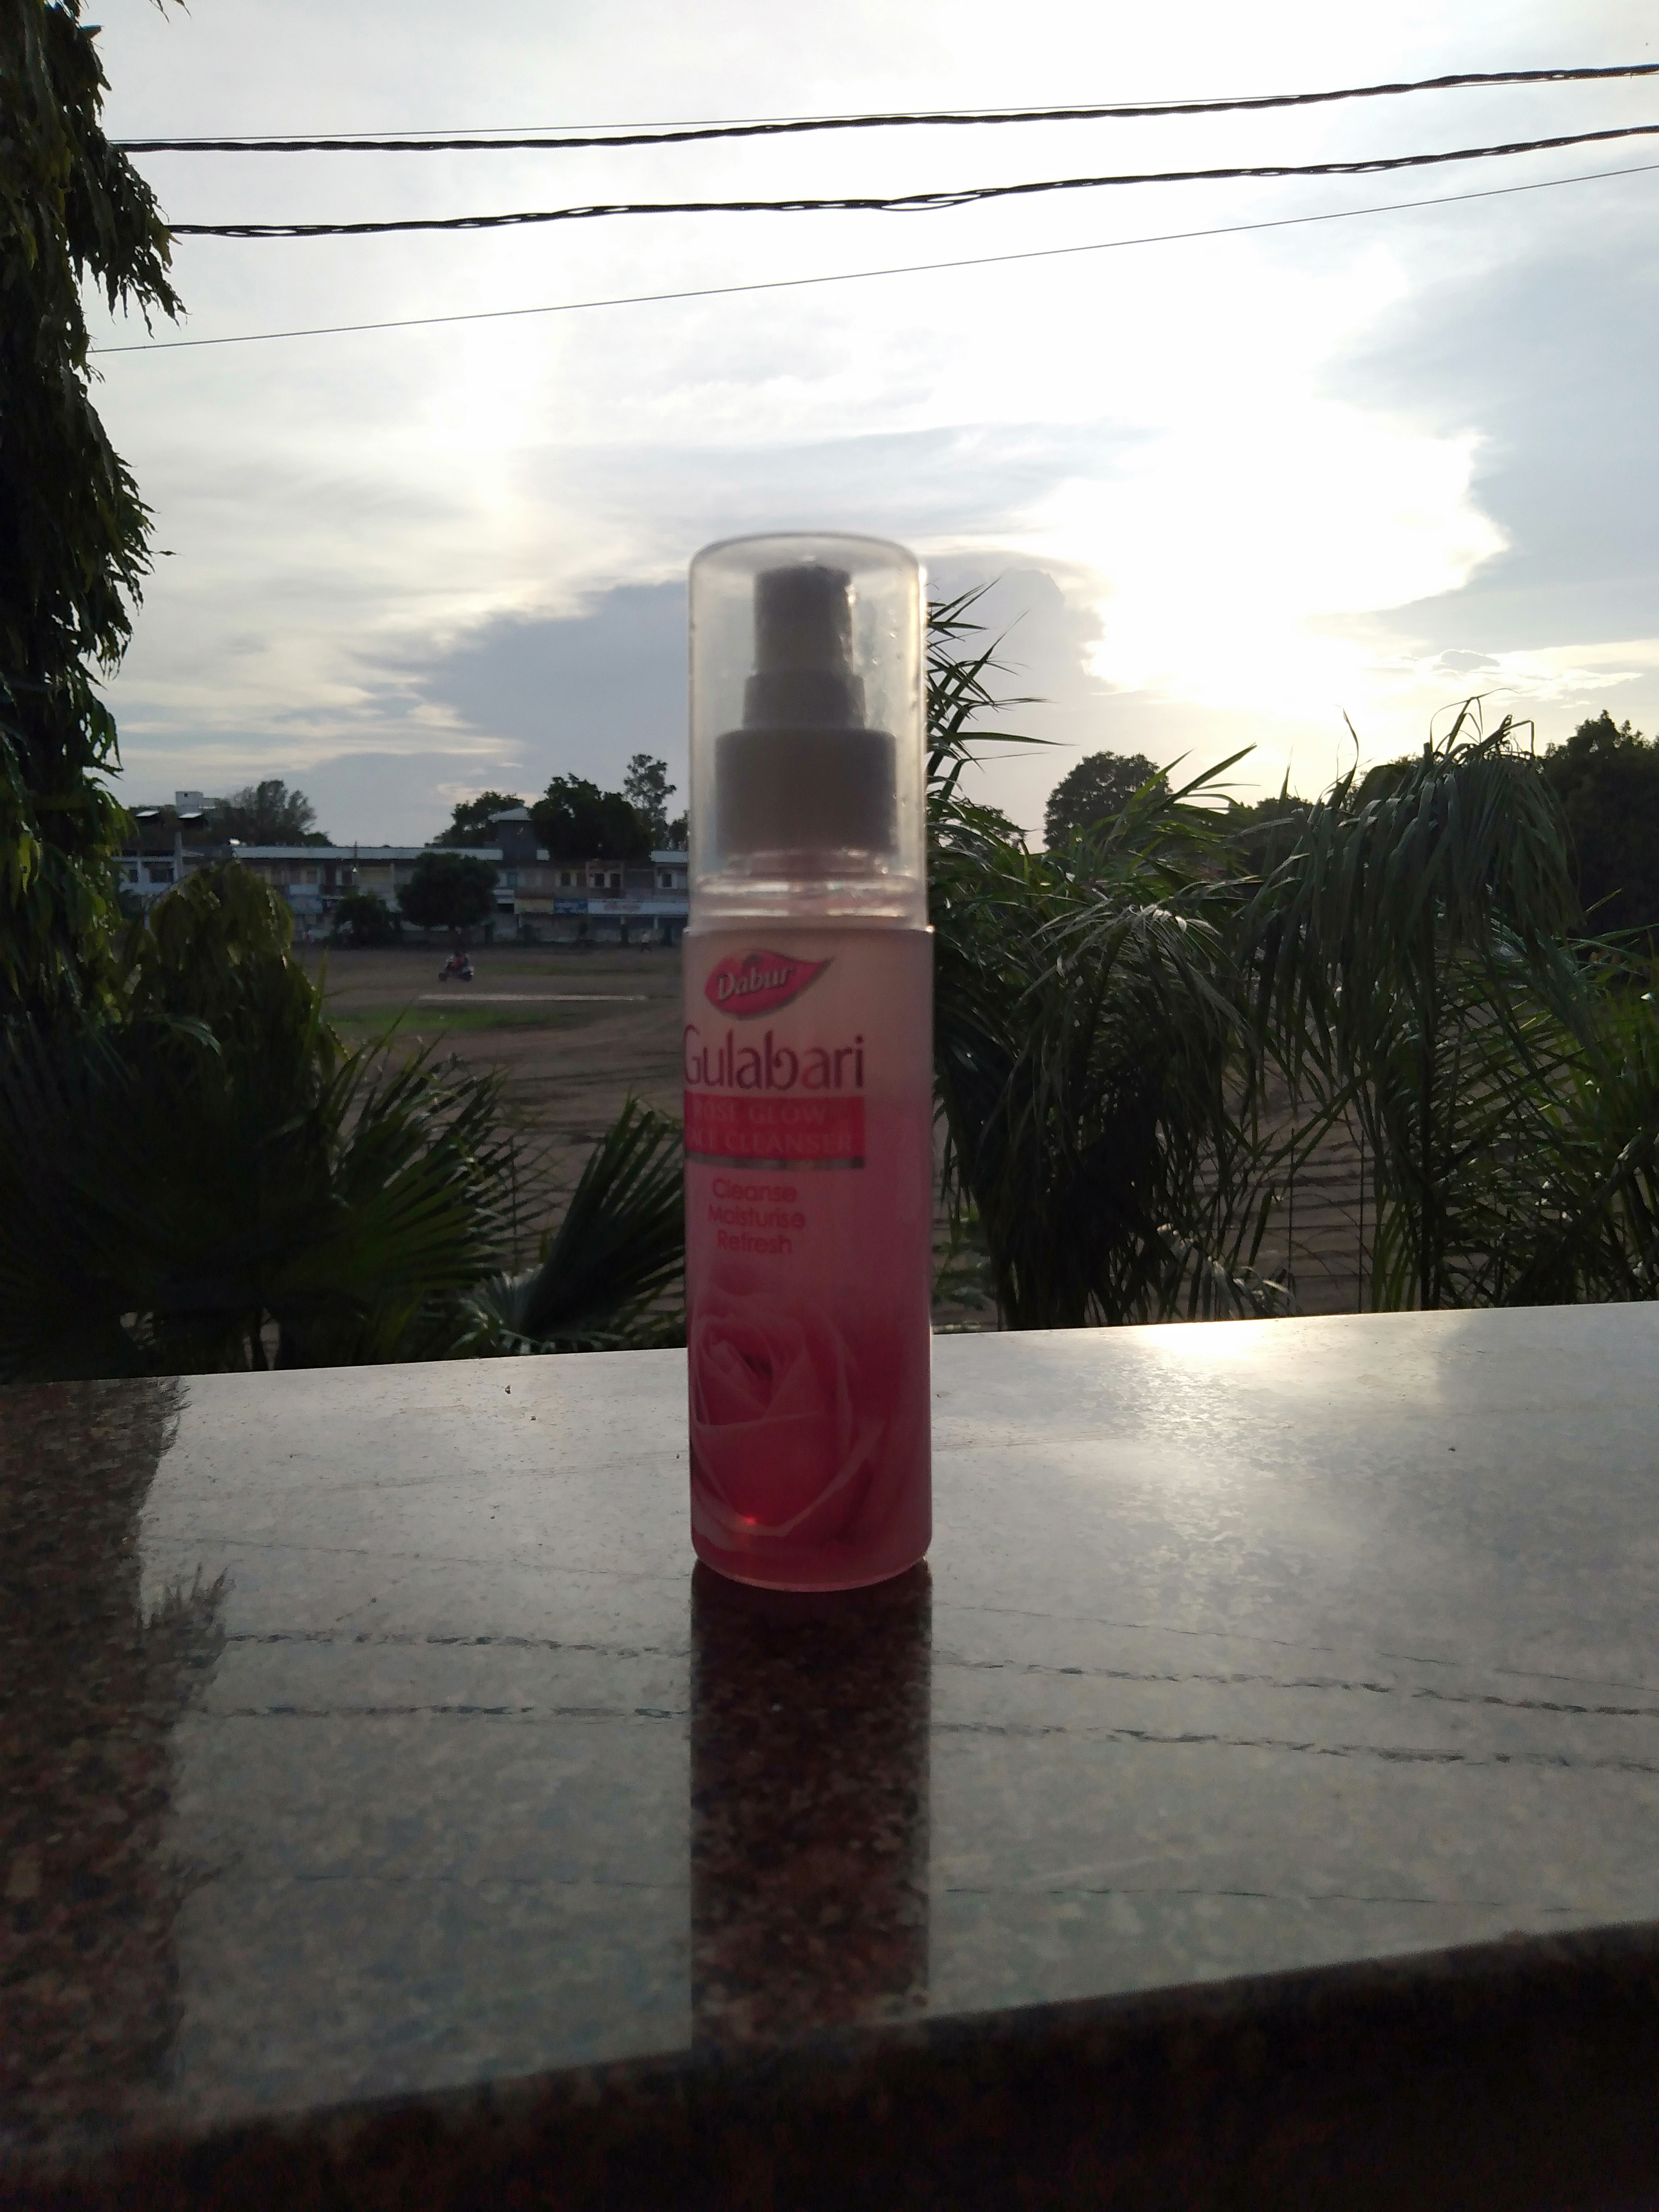 Dabur Gulabari Premium Rose Water-Super Affordable and Most effective-By drastuu-1